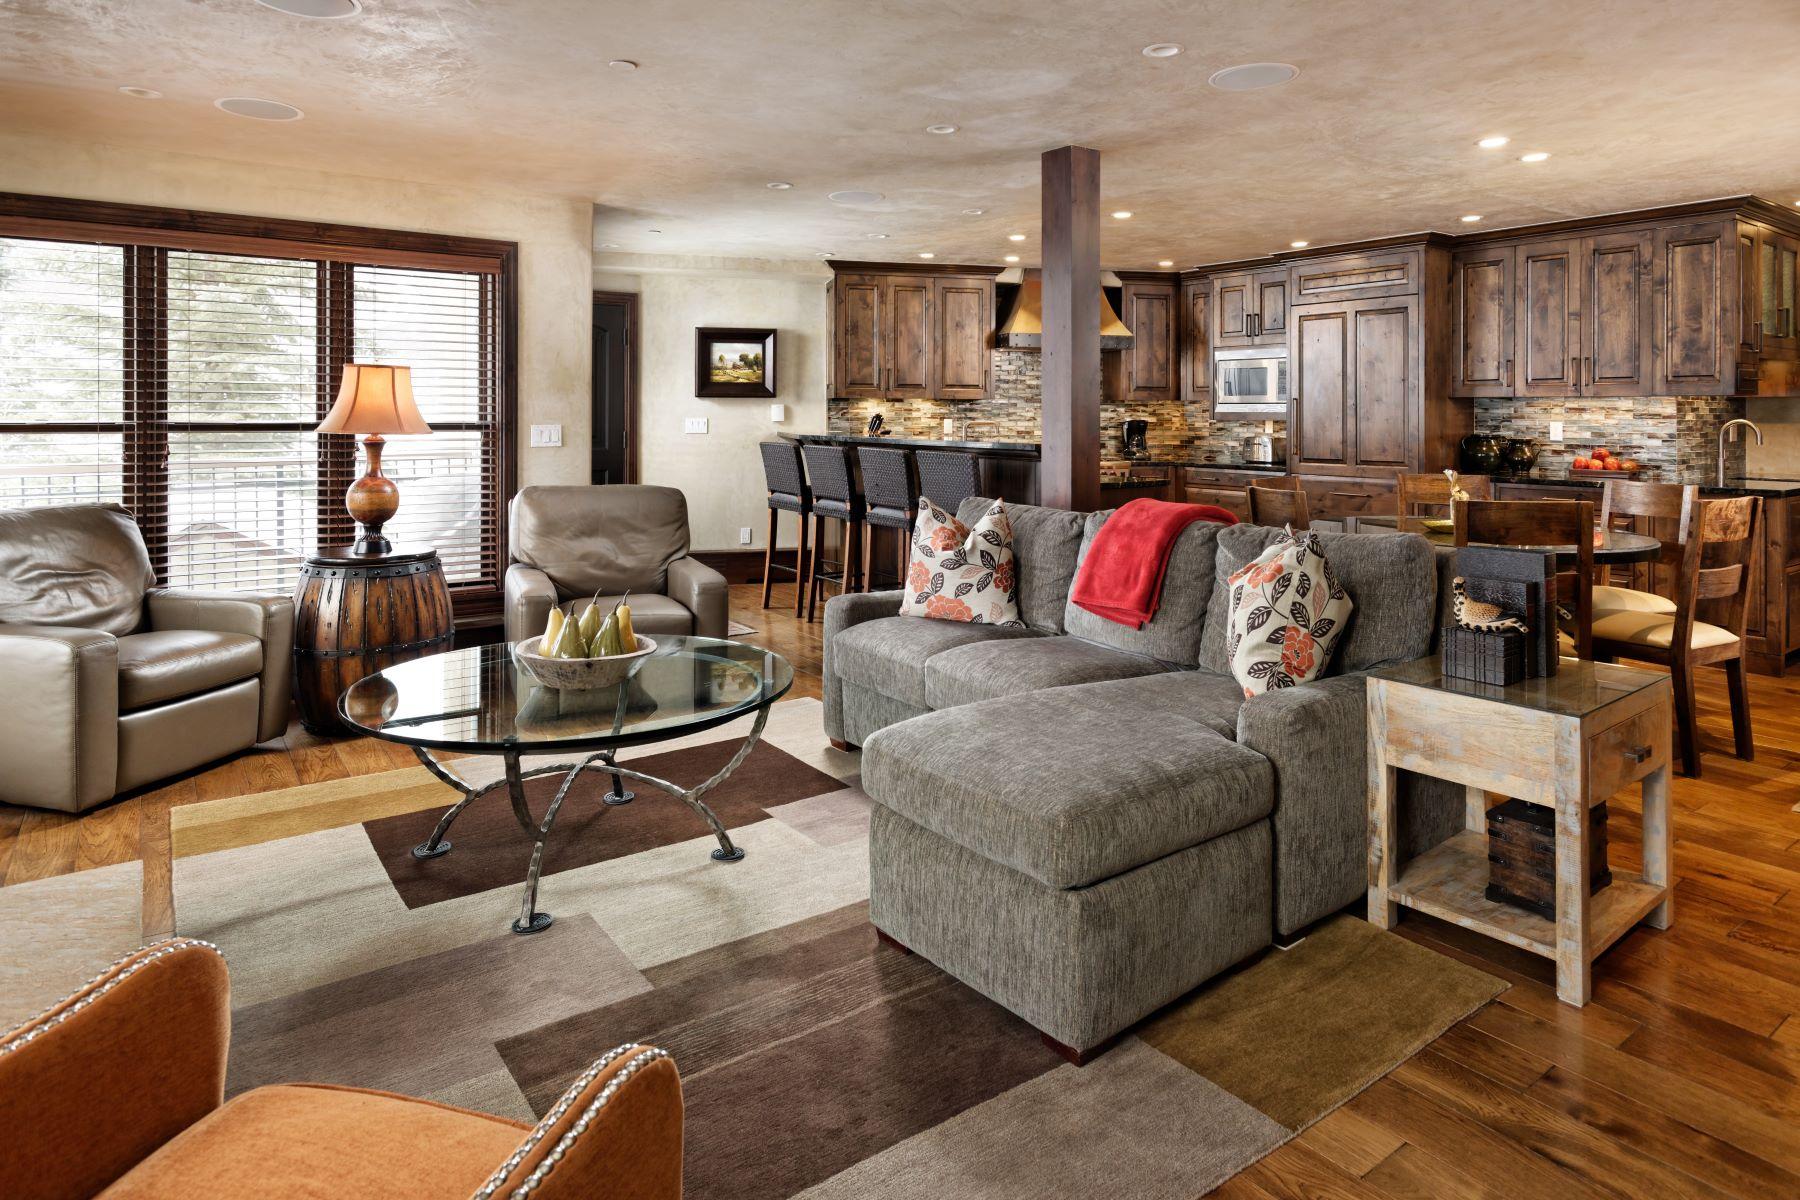 Condominiums для того Продажа на As Nice as They Come! 425 Wood Road, Unit 41, Snowmass Village, Колорадо 81615 Соединенные Штаты